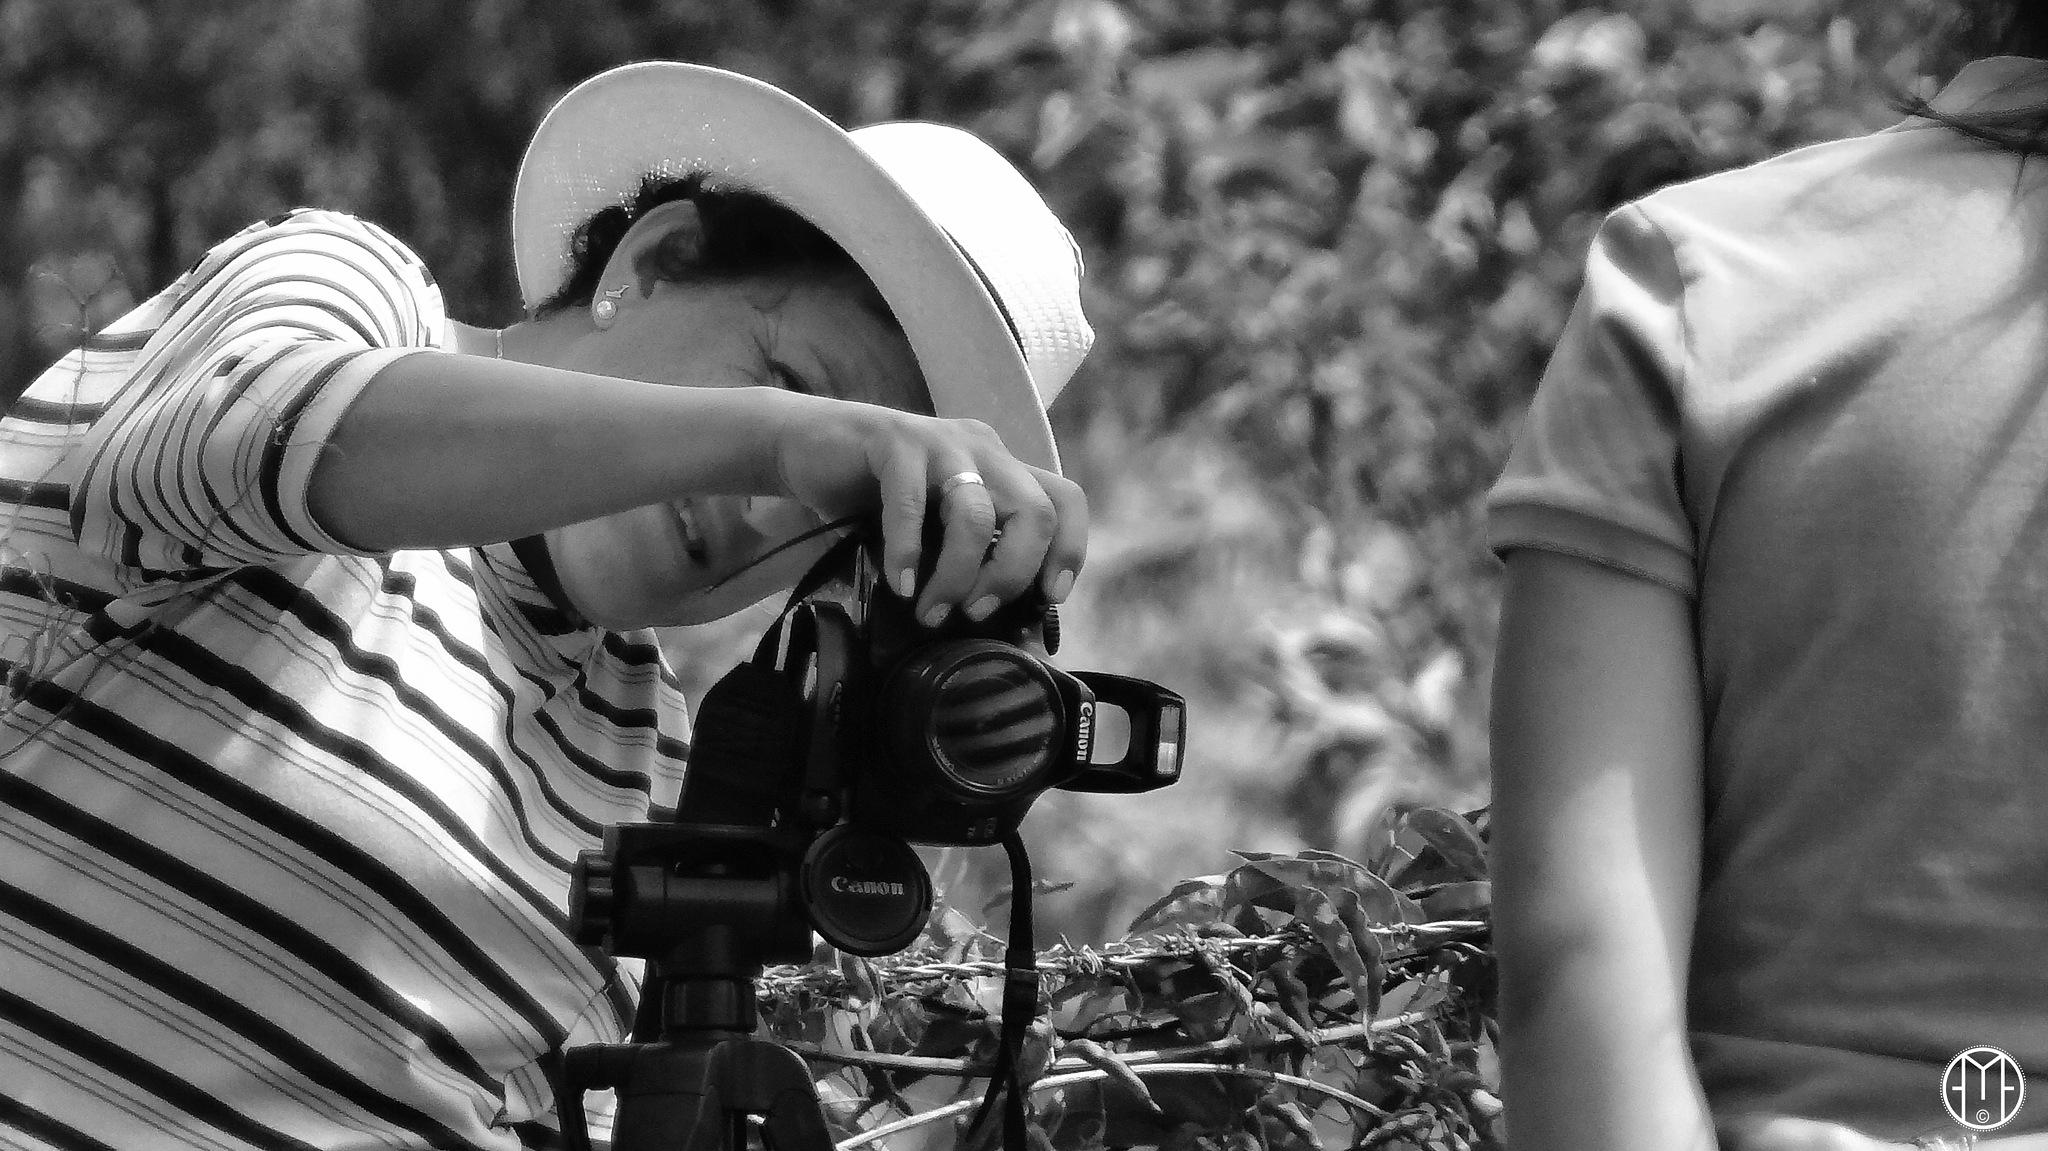 Take a Shot - Haciendo una toma by Gabriel Ochoa Rojas